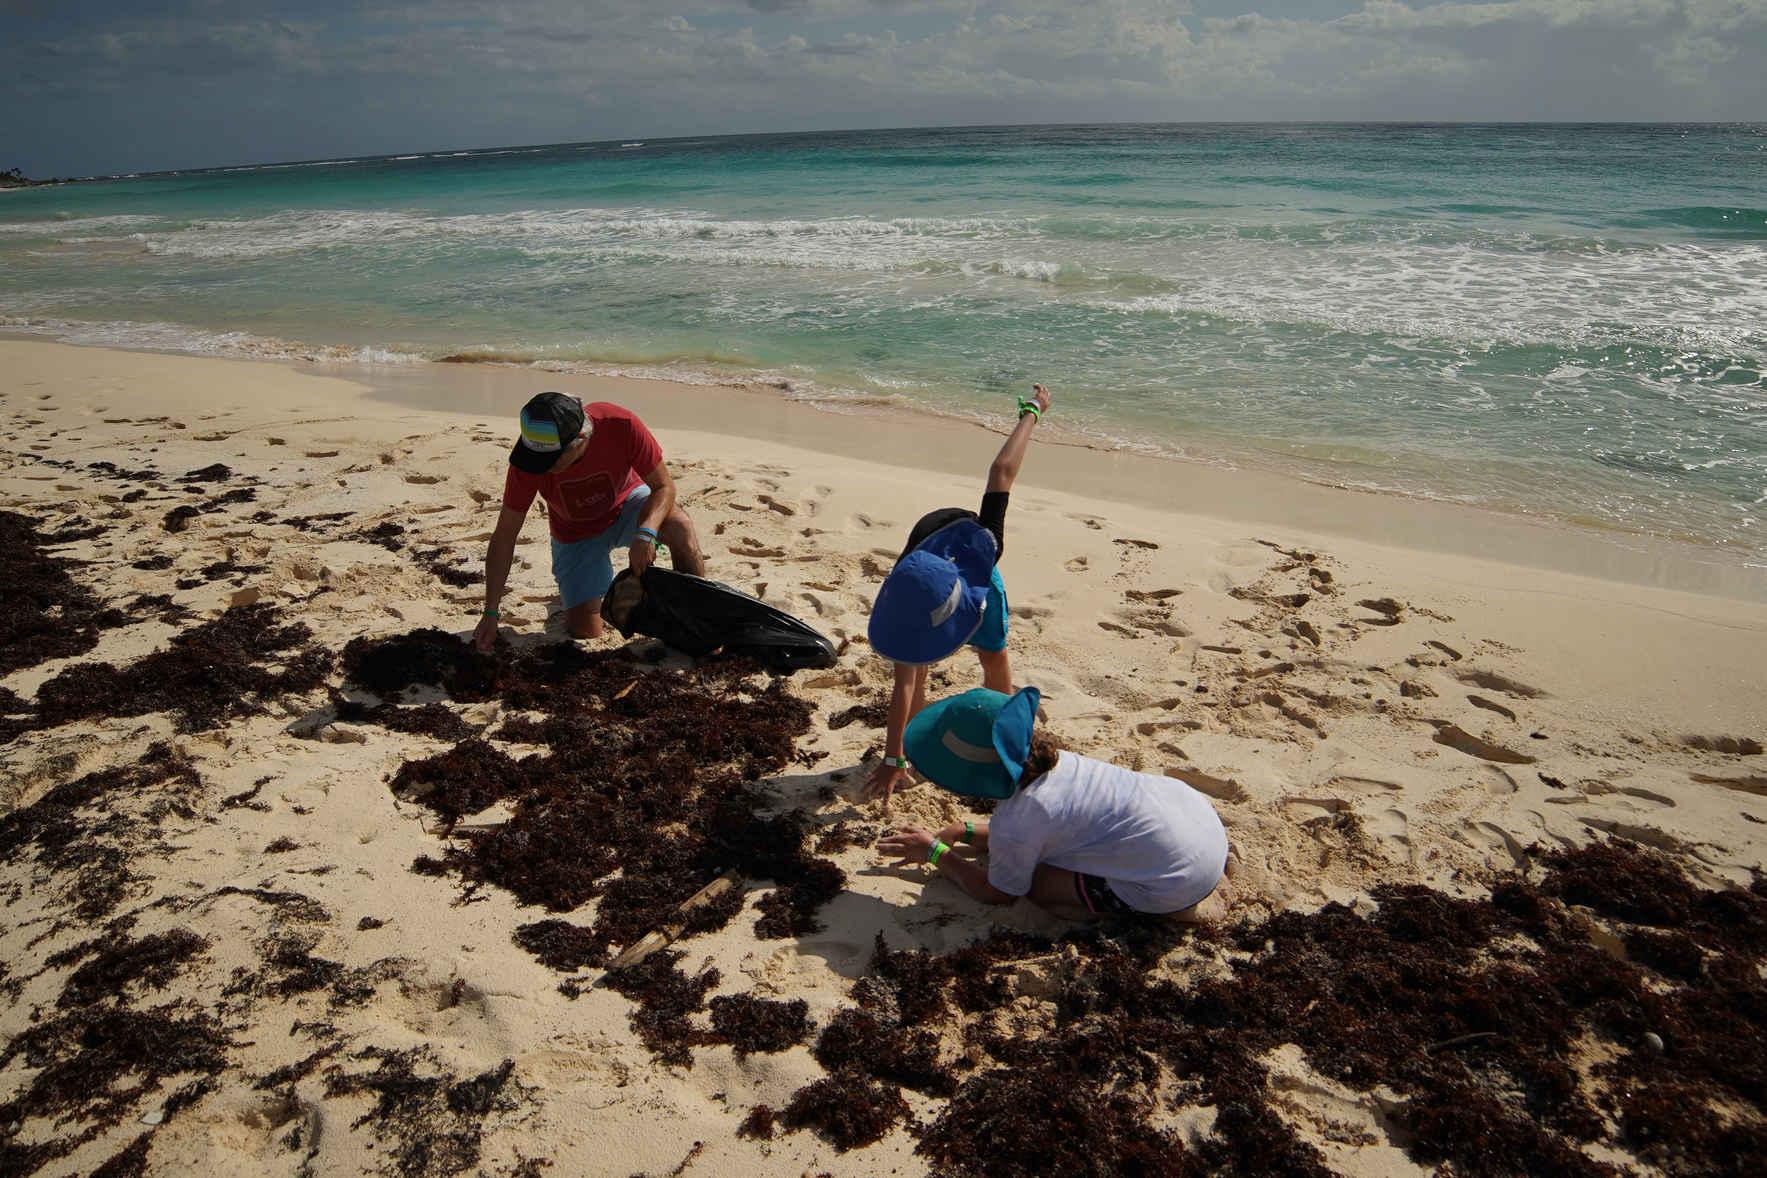 Panic En La Playa Nueve: Day of Service & Sustainable Experience image